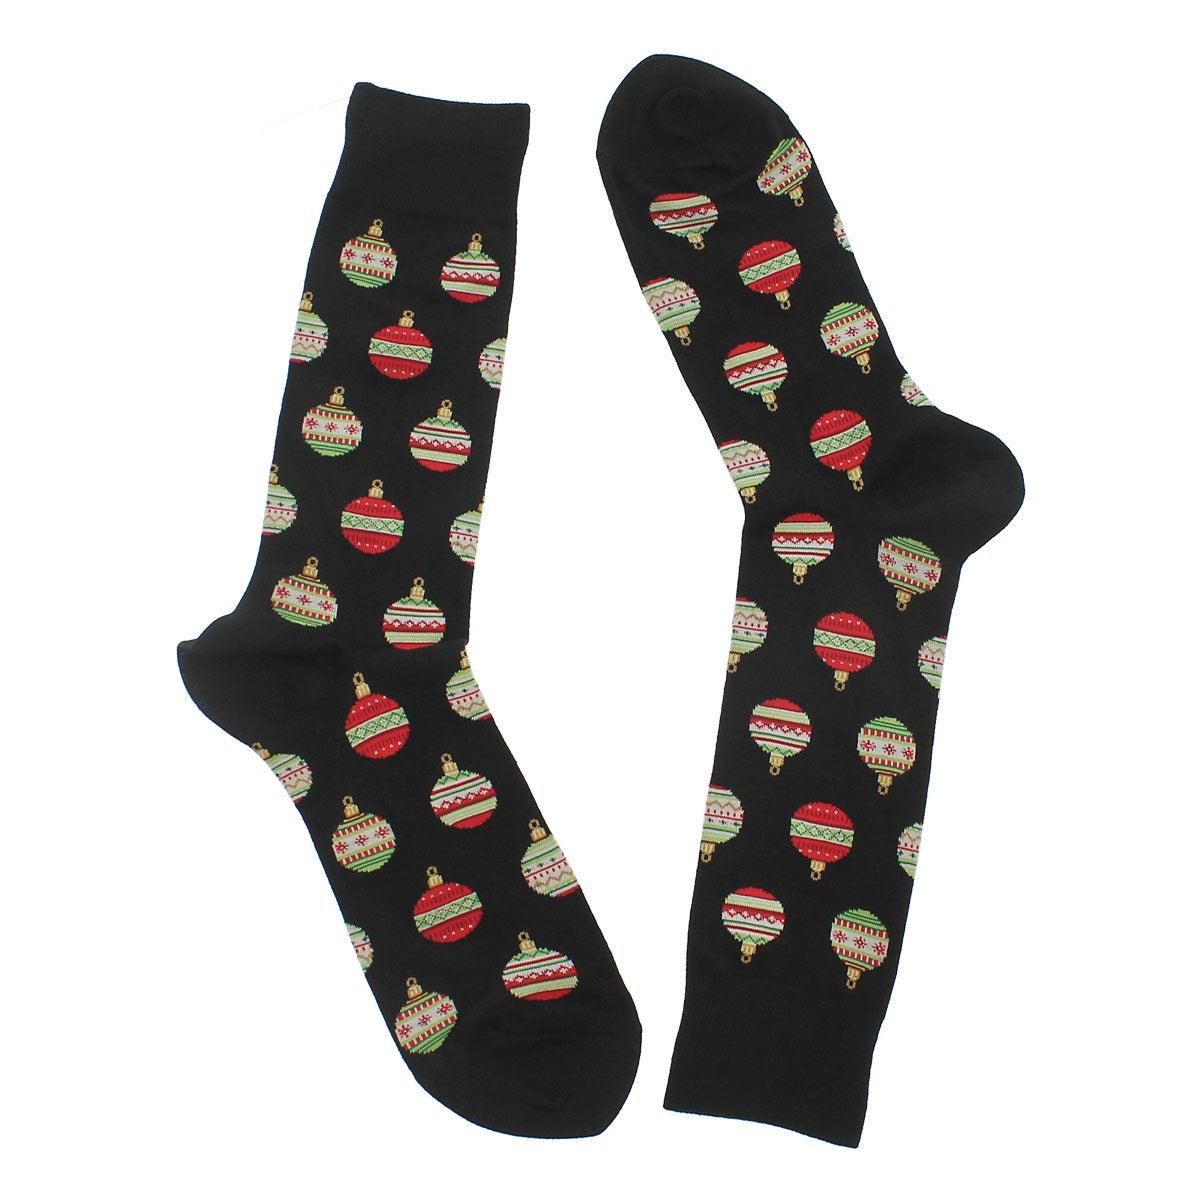 Mns Christmas Ornaments blk printed sock